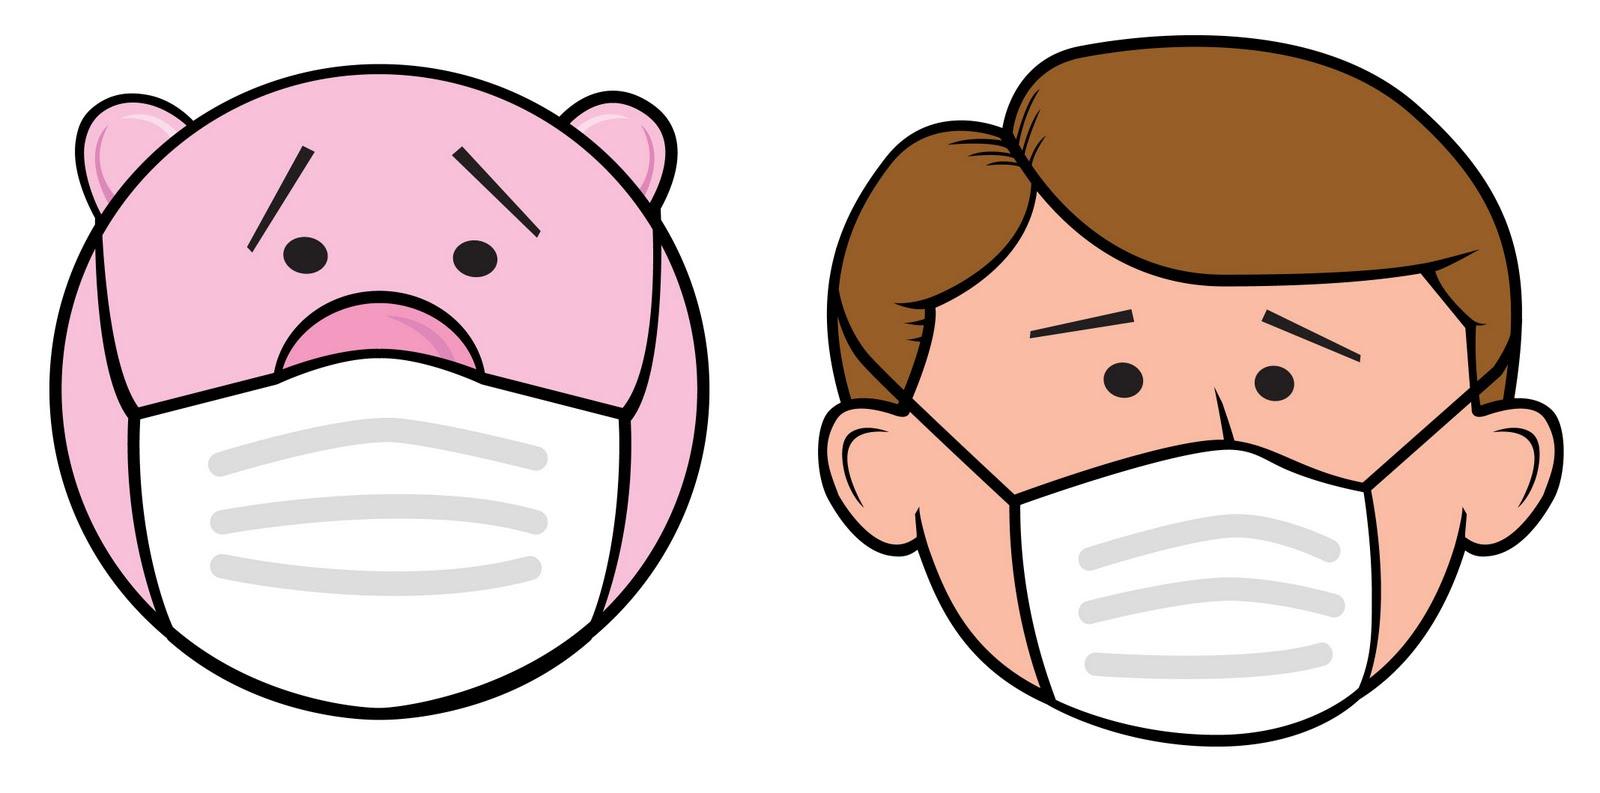 Mask clipart sick MASK face SHOULD face you